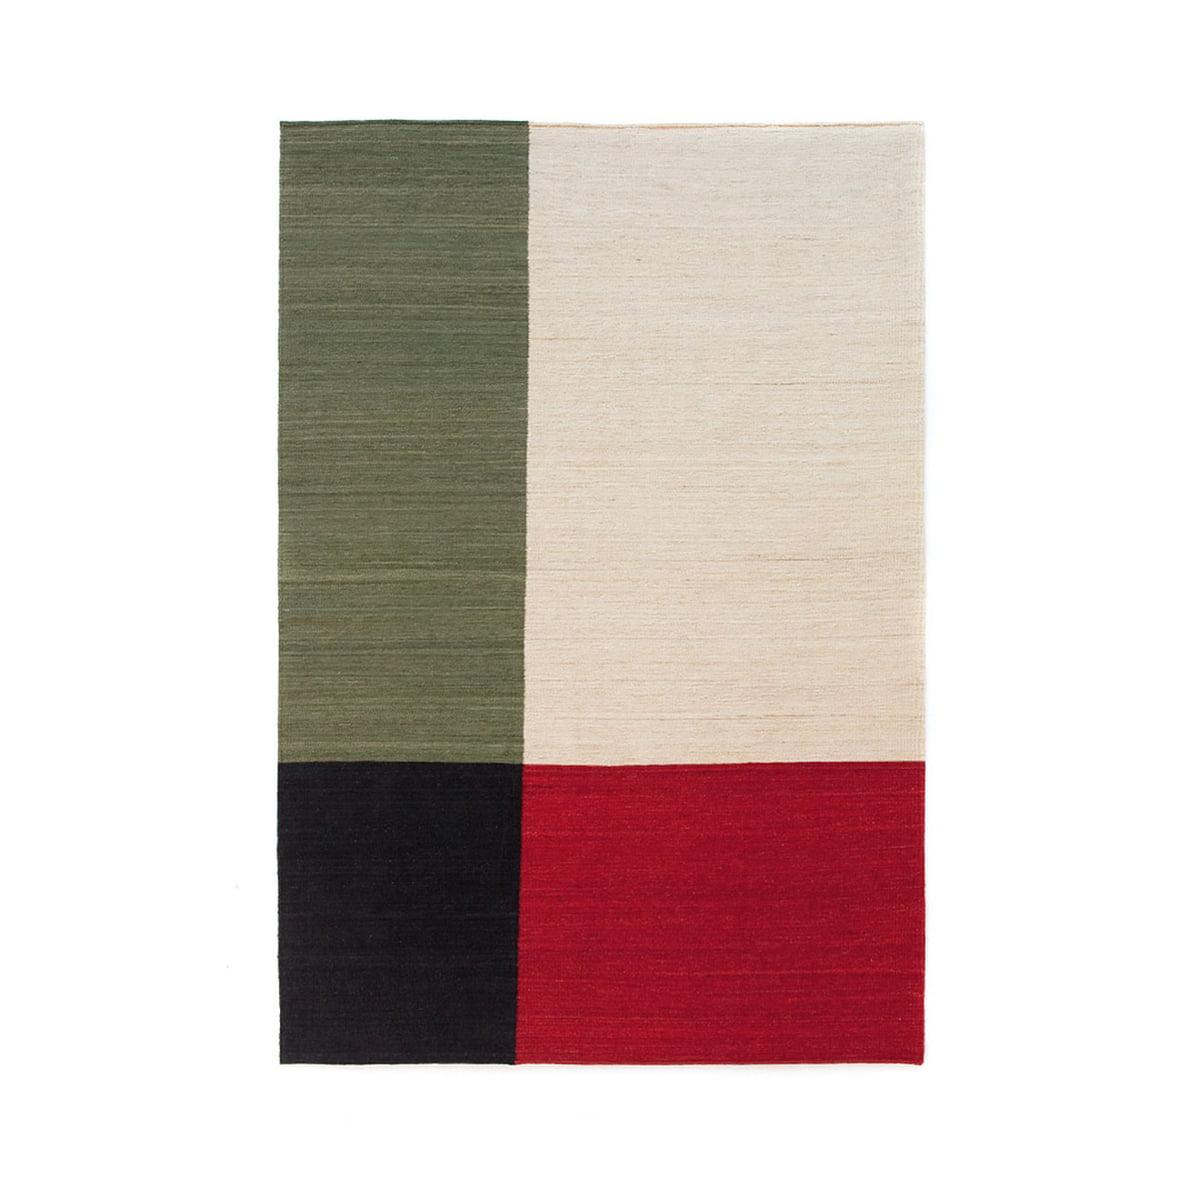 Https Www Connox Com Categories Home Textiles Rugs Myfelt Lotte